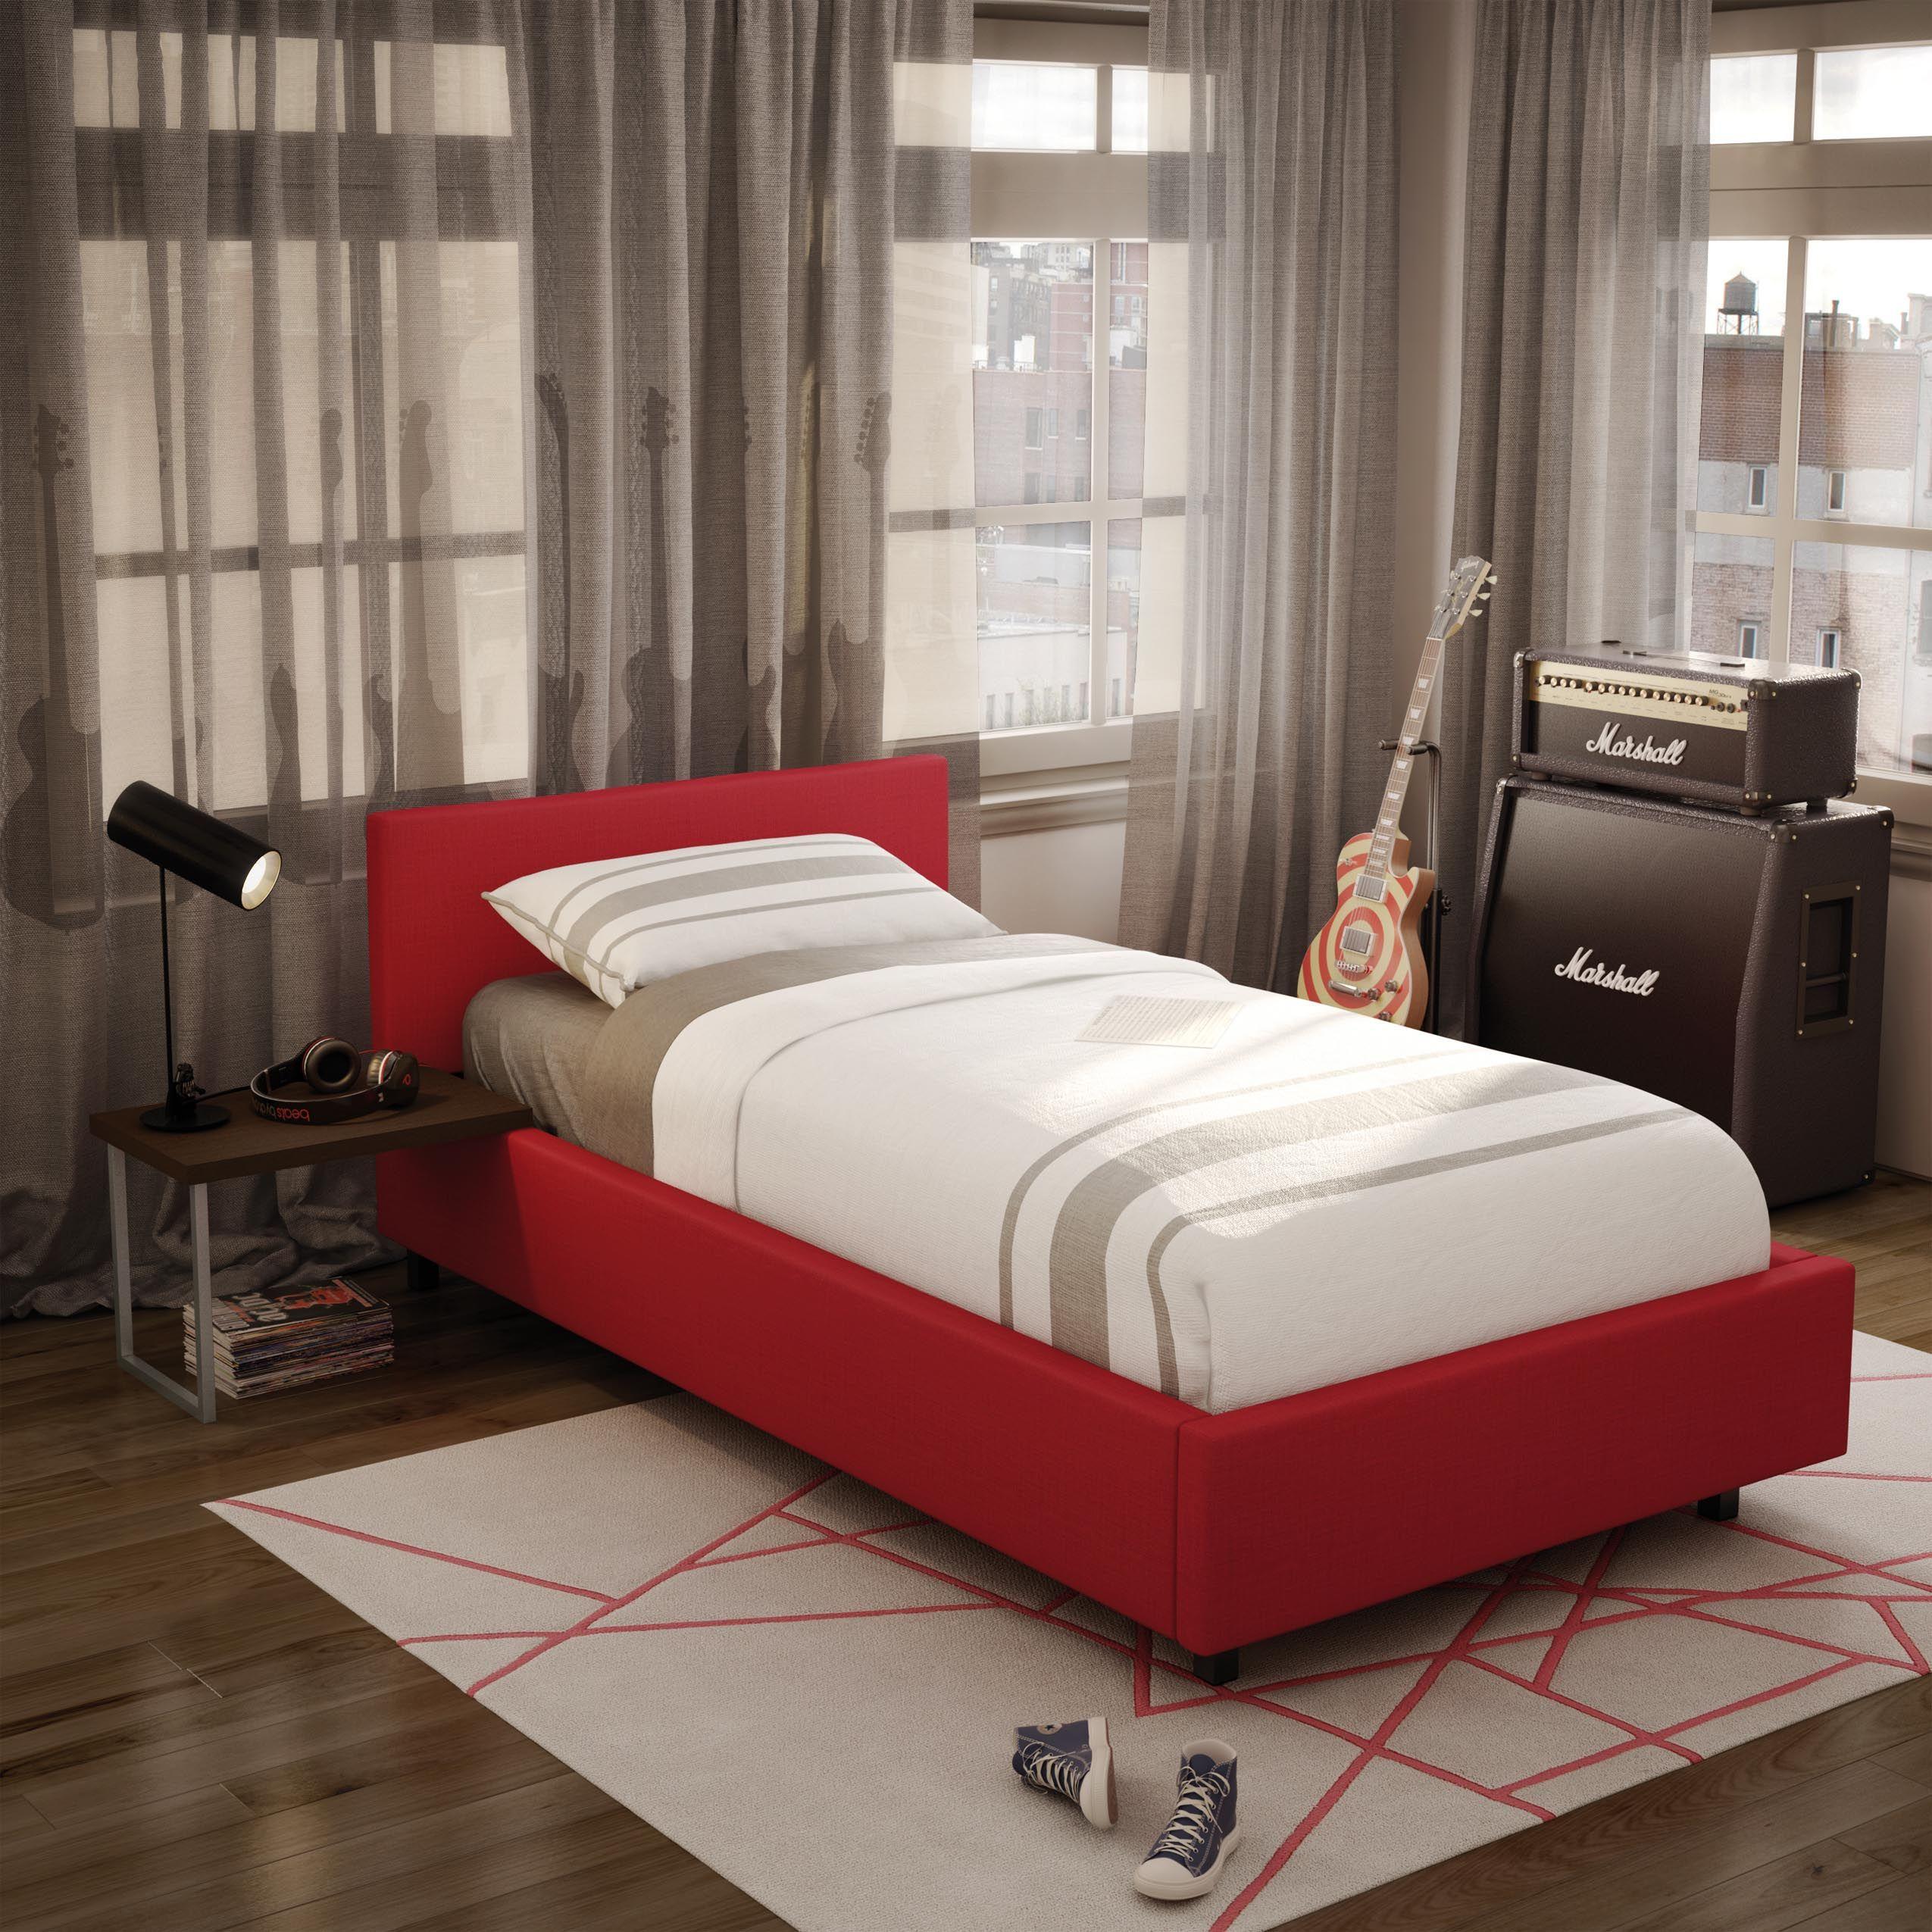 amisco bridge bed 12371 furniture bedroom urban. AMISCO - Gastown Kid Bed (12511-54) Furniture Bedroom Urban Collection Contemporary Upholstered | Pinterest And Amisco Bridge 12371